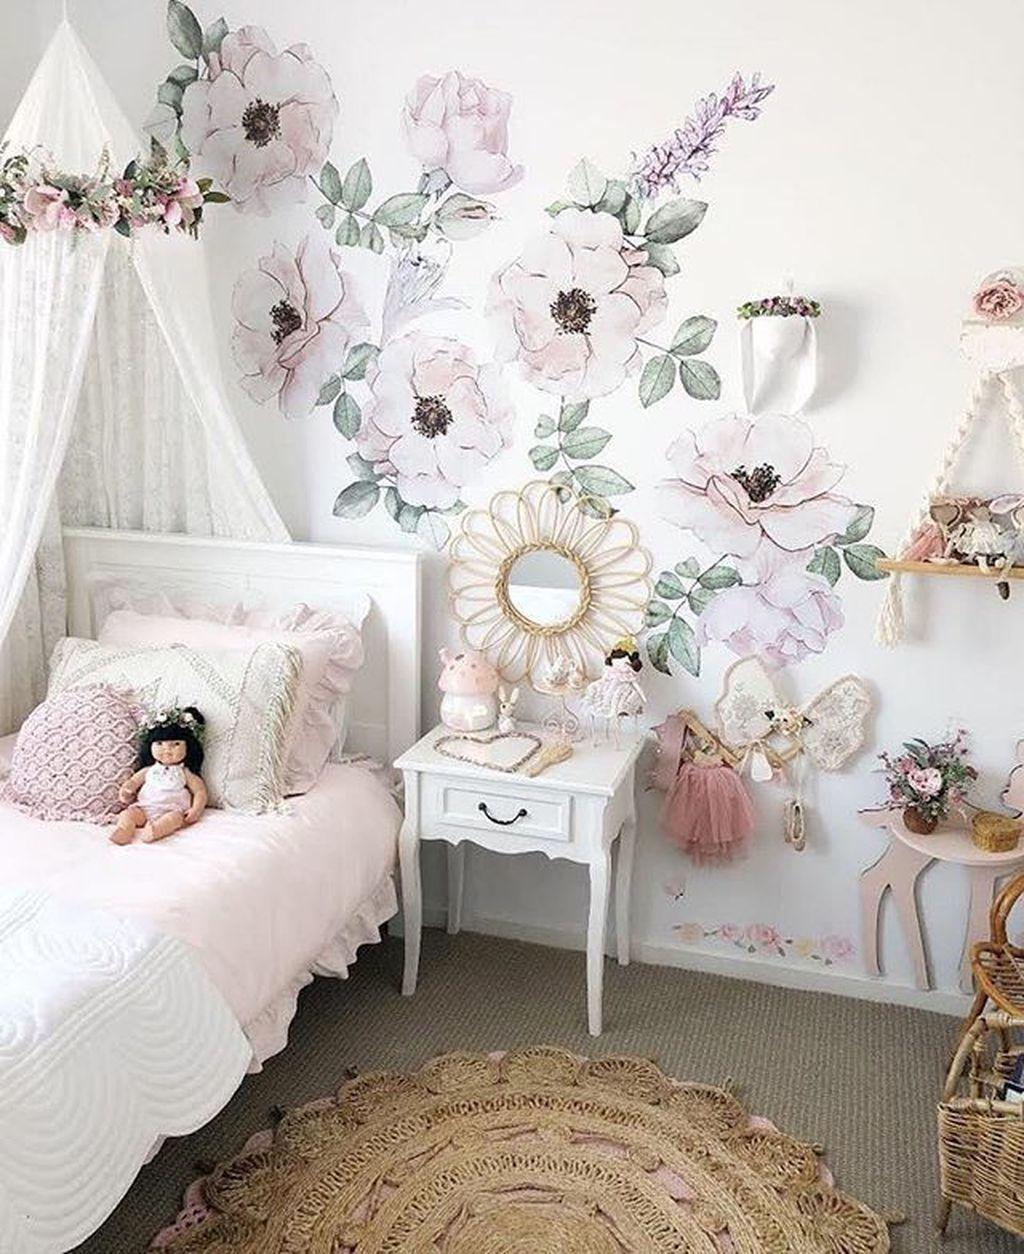 6+ Vintage Bedroom Wall Decals Design Ideas To Try  Bedroom